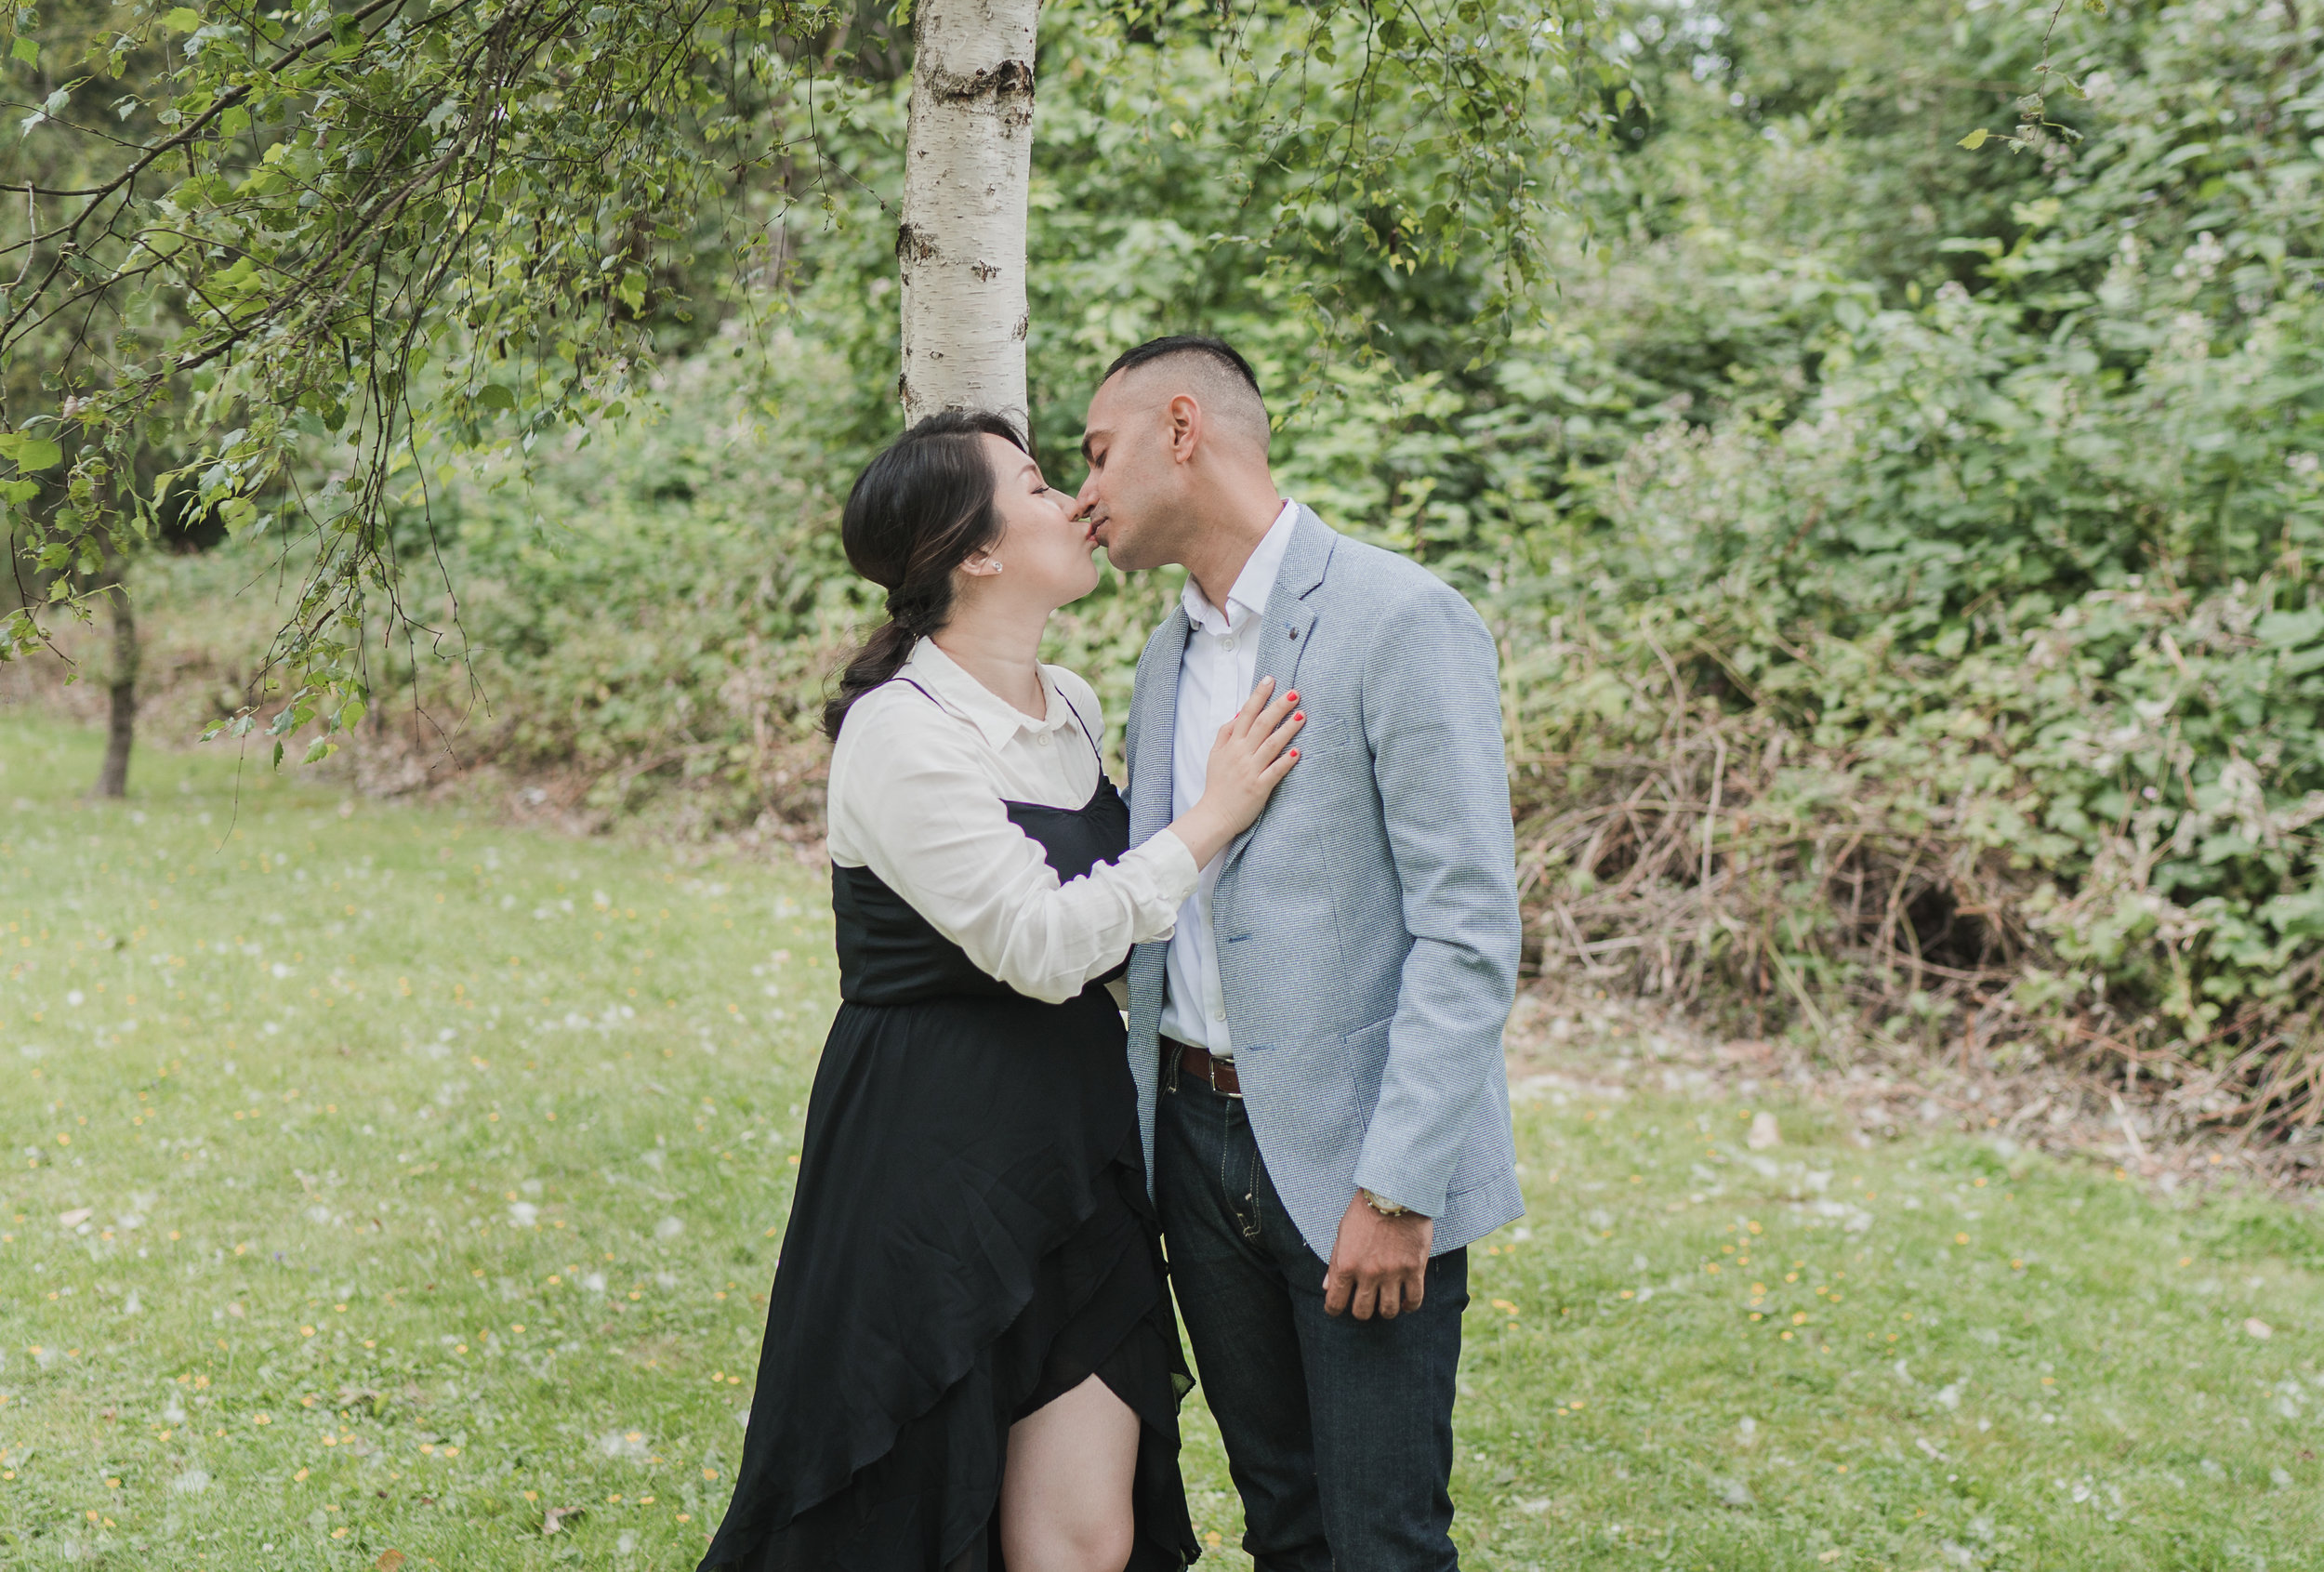 20190622 - Monika & Johnson Engagement- 0054.jpg